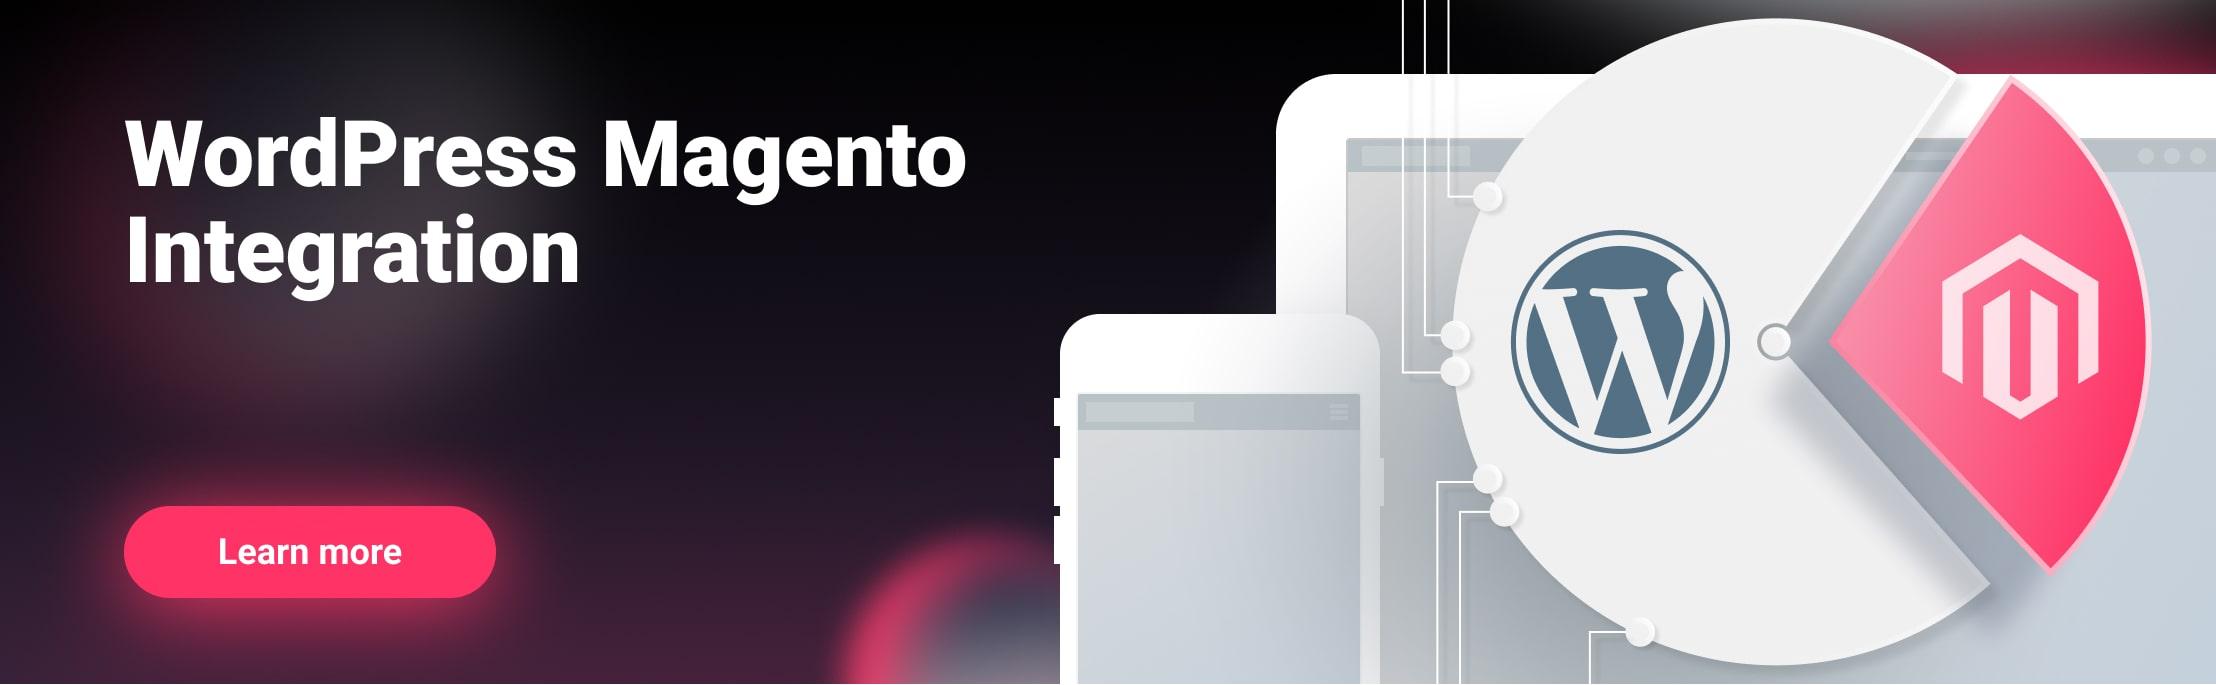 WordPress Magento Integration